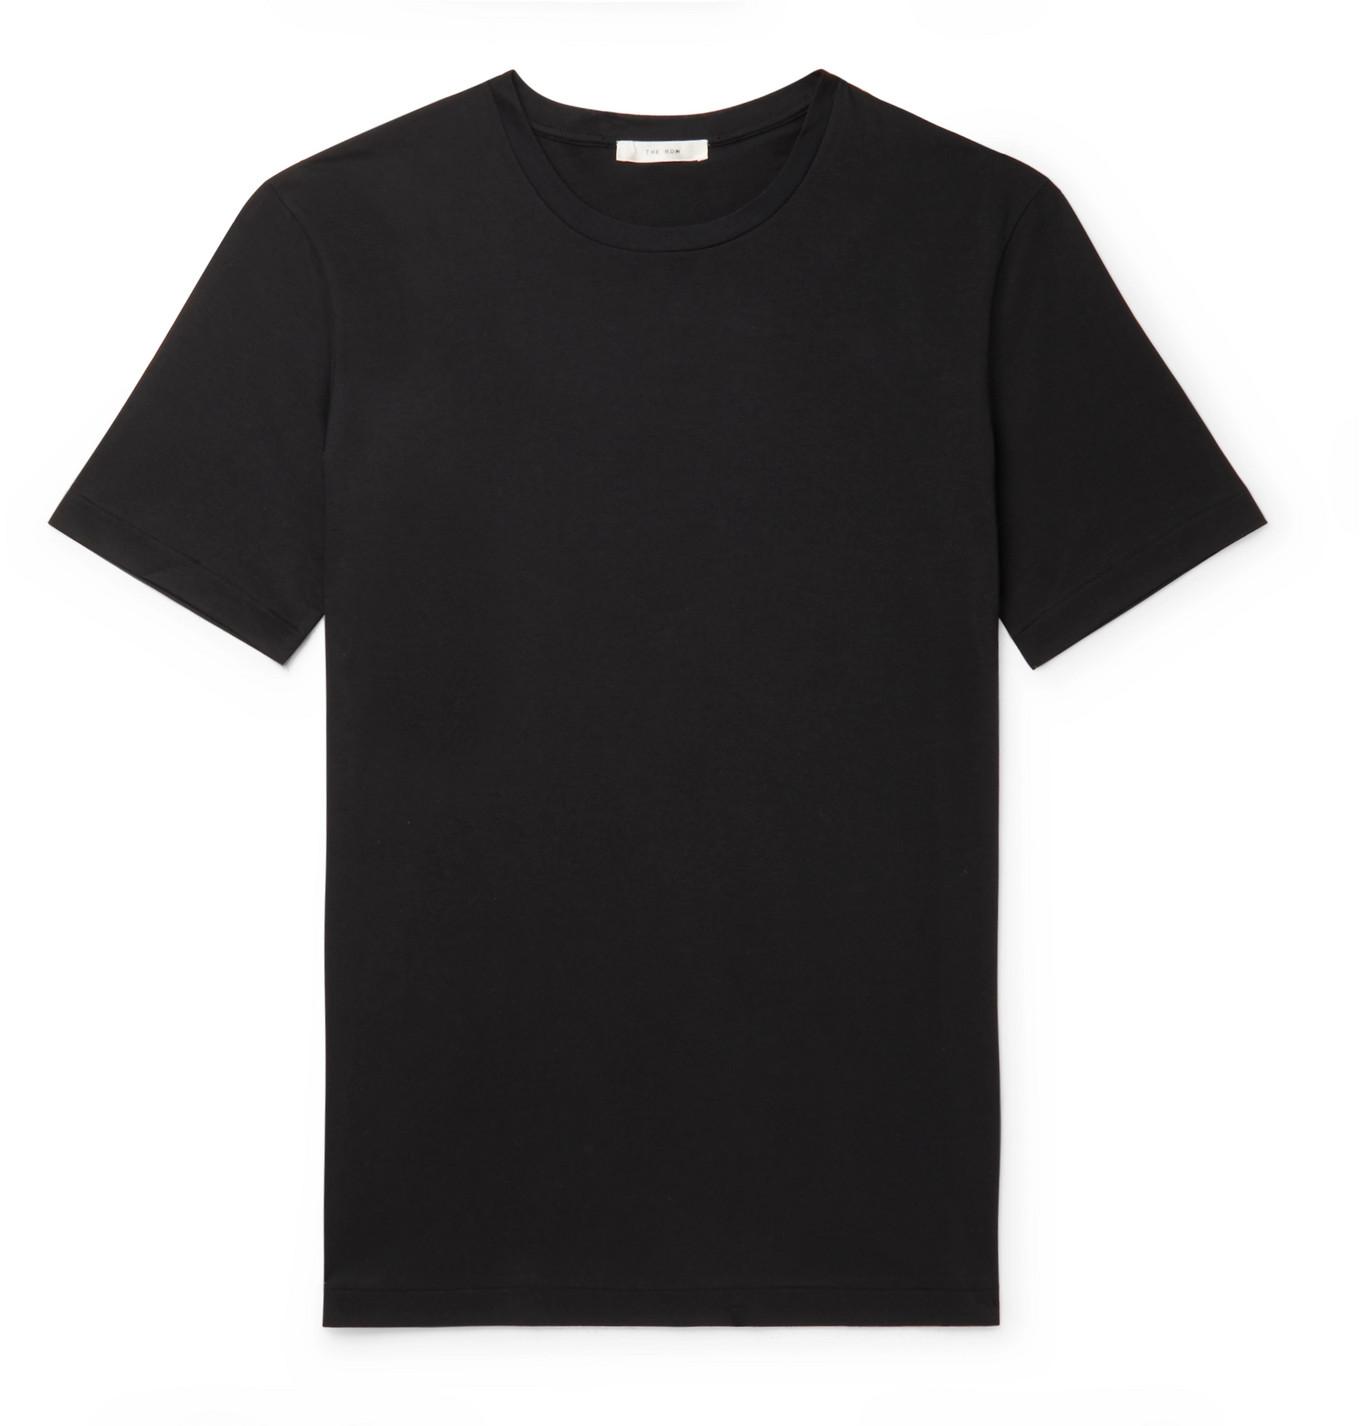 The Row - Luke Cotton-Jersey T-Shirt - Men - Black